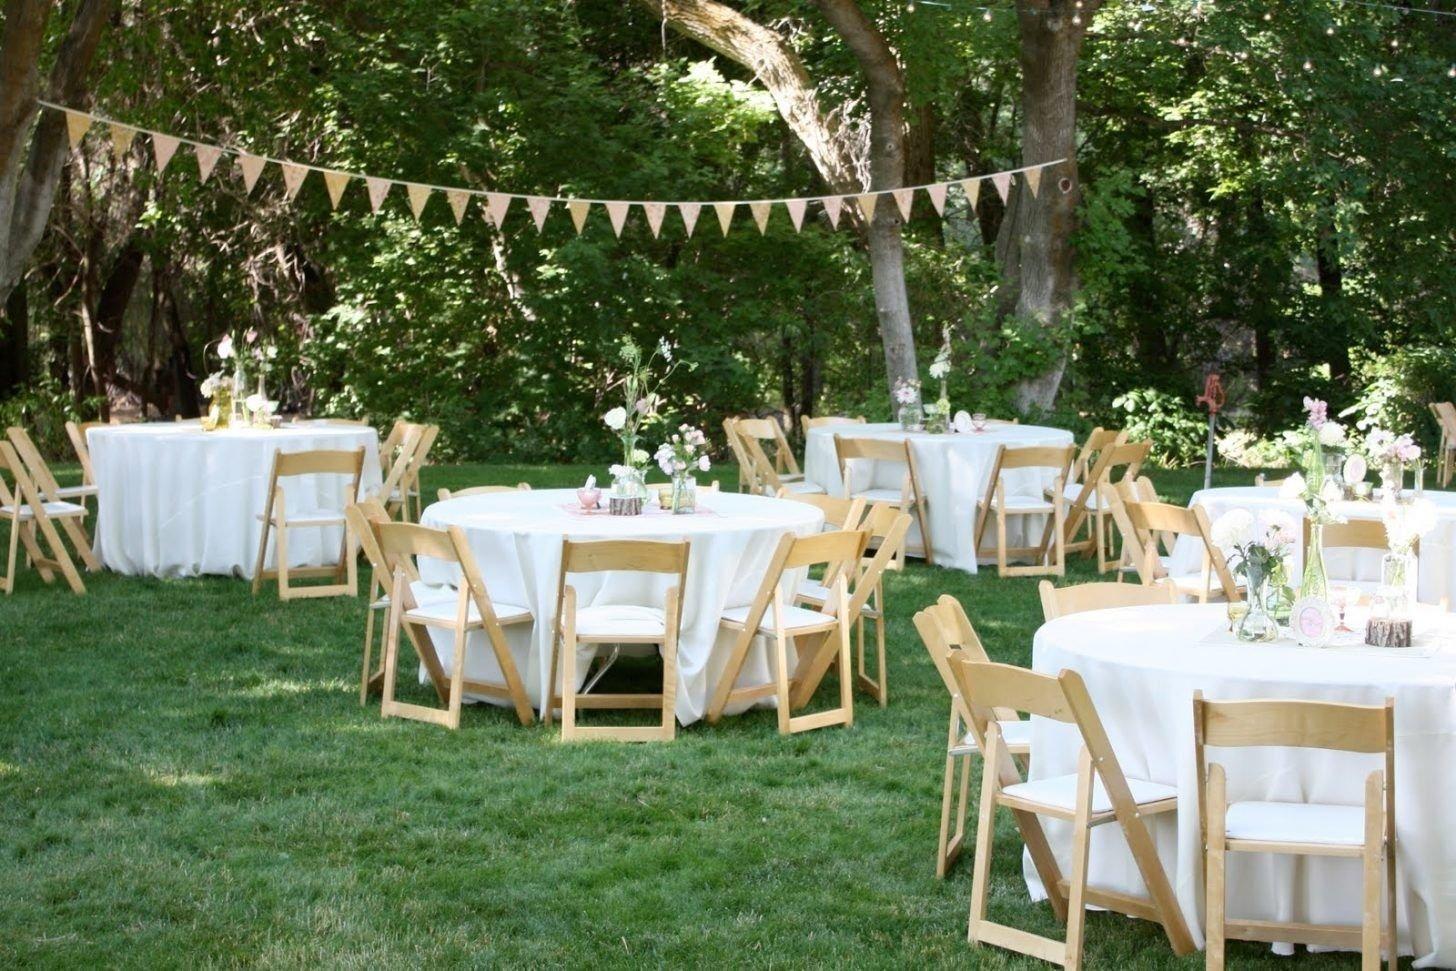 10 Cute Backyard Wedding Ideas For Summer incredible best decorating ideas for a backyard wedding pics of how 2020